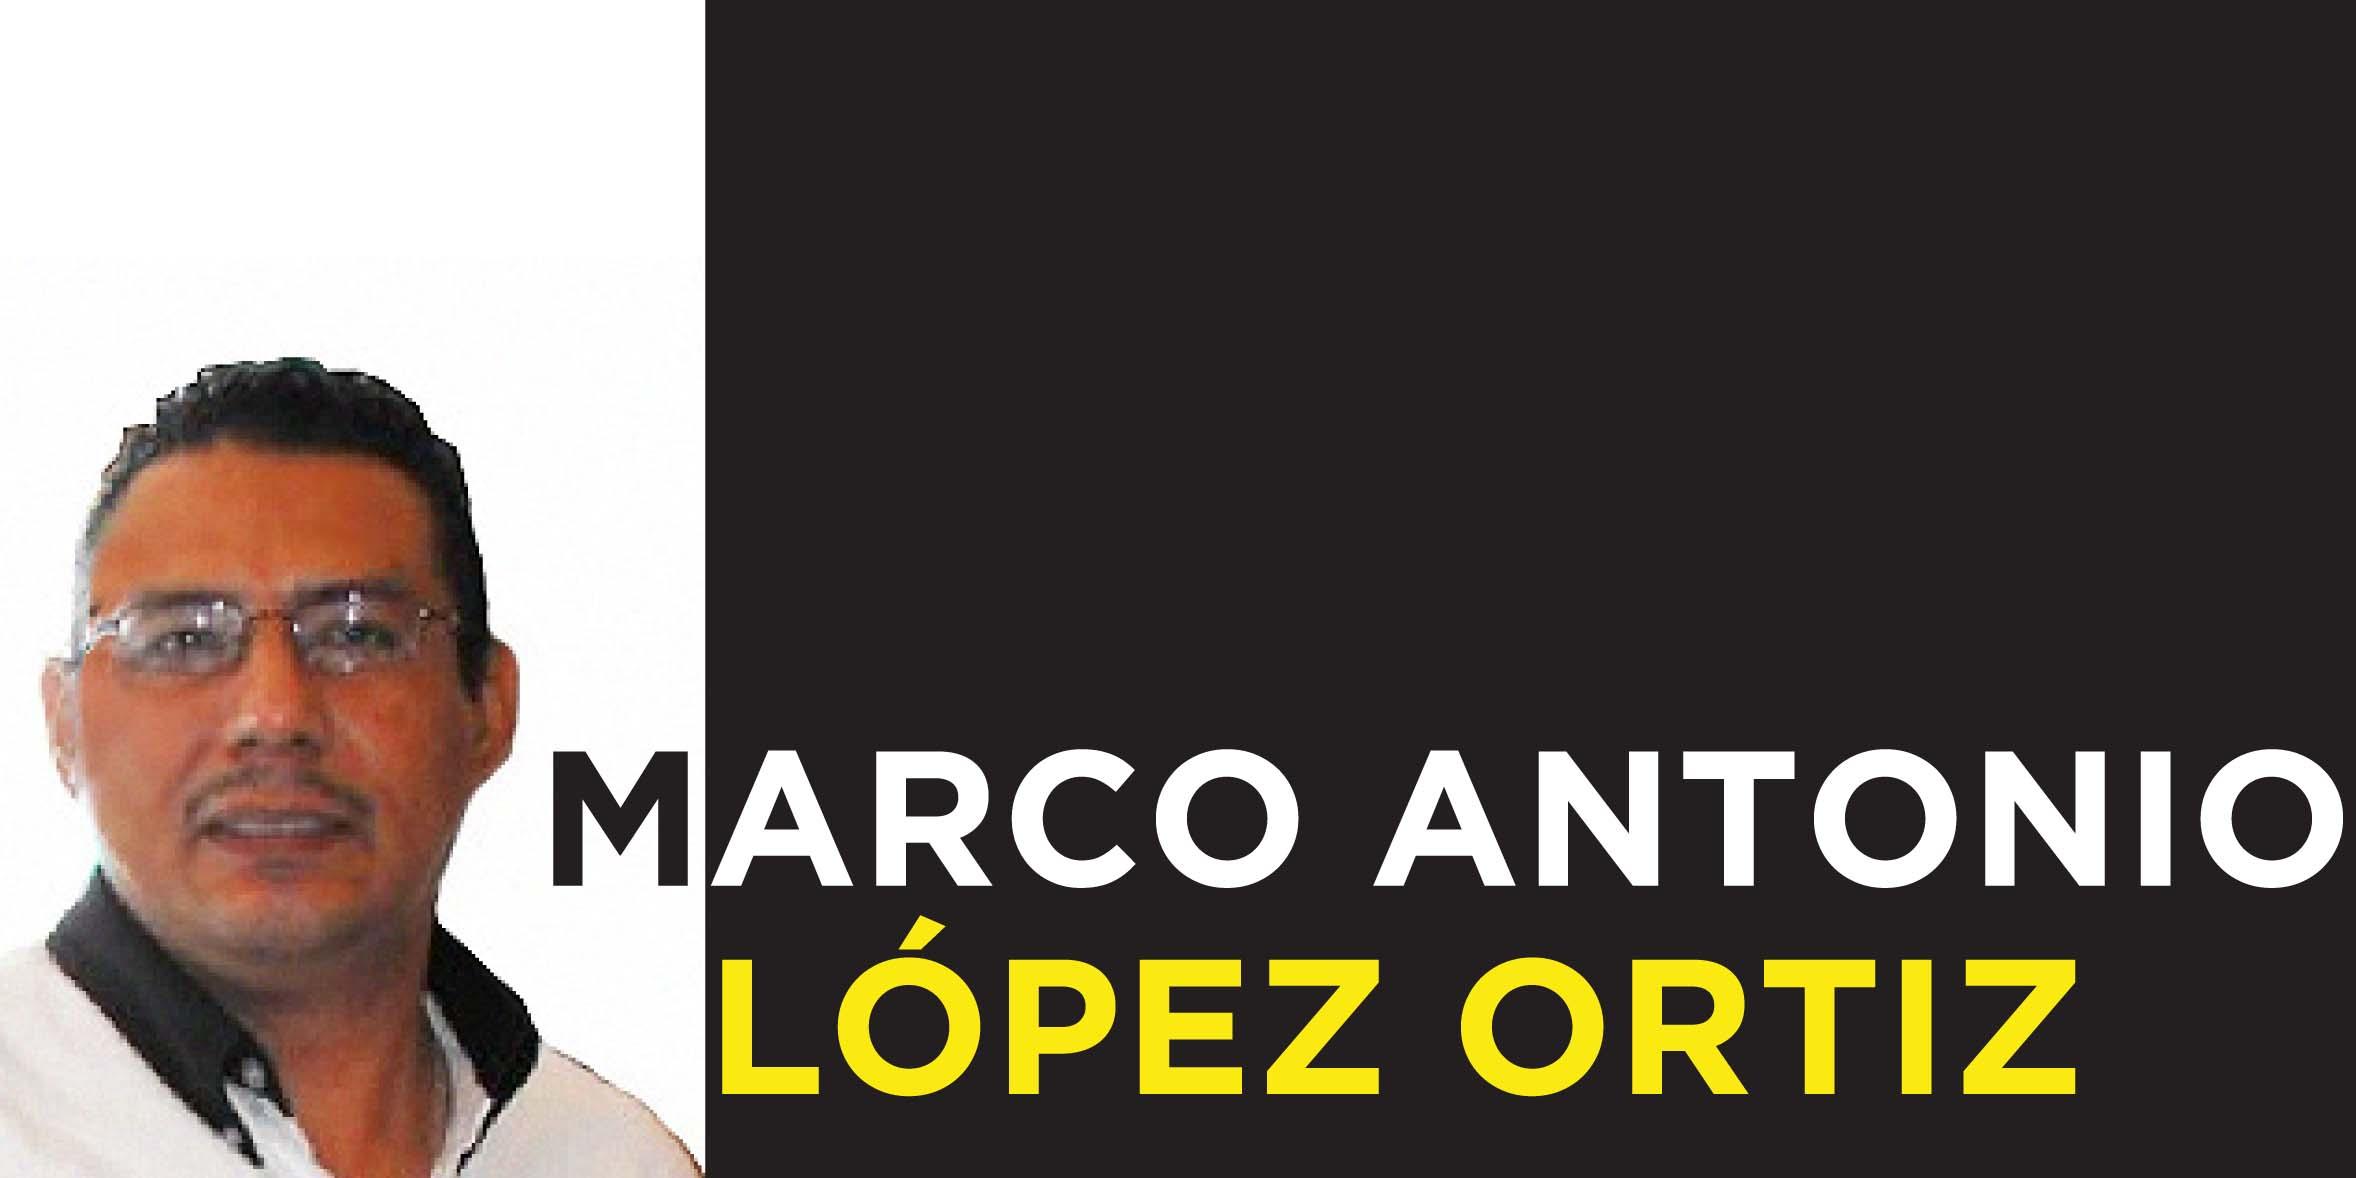 Marco Antonio López Ortiz